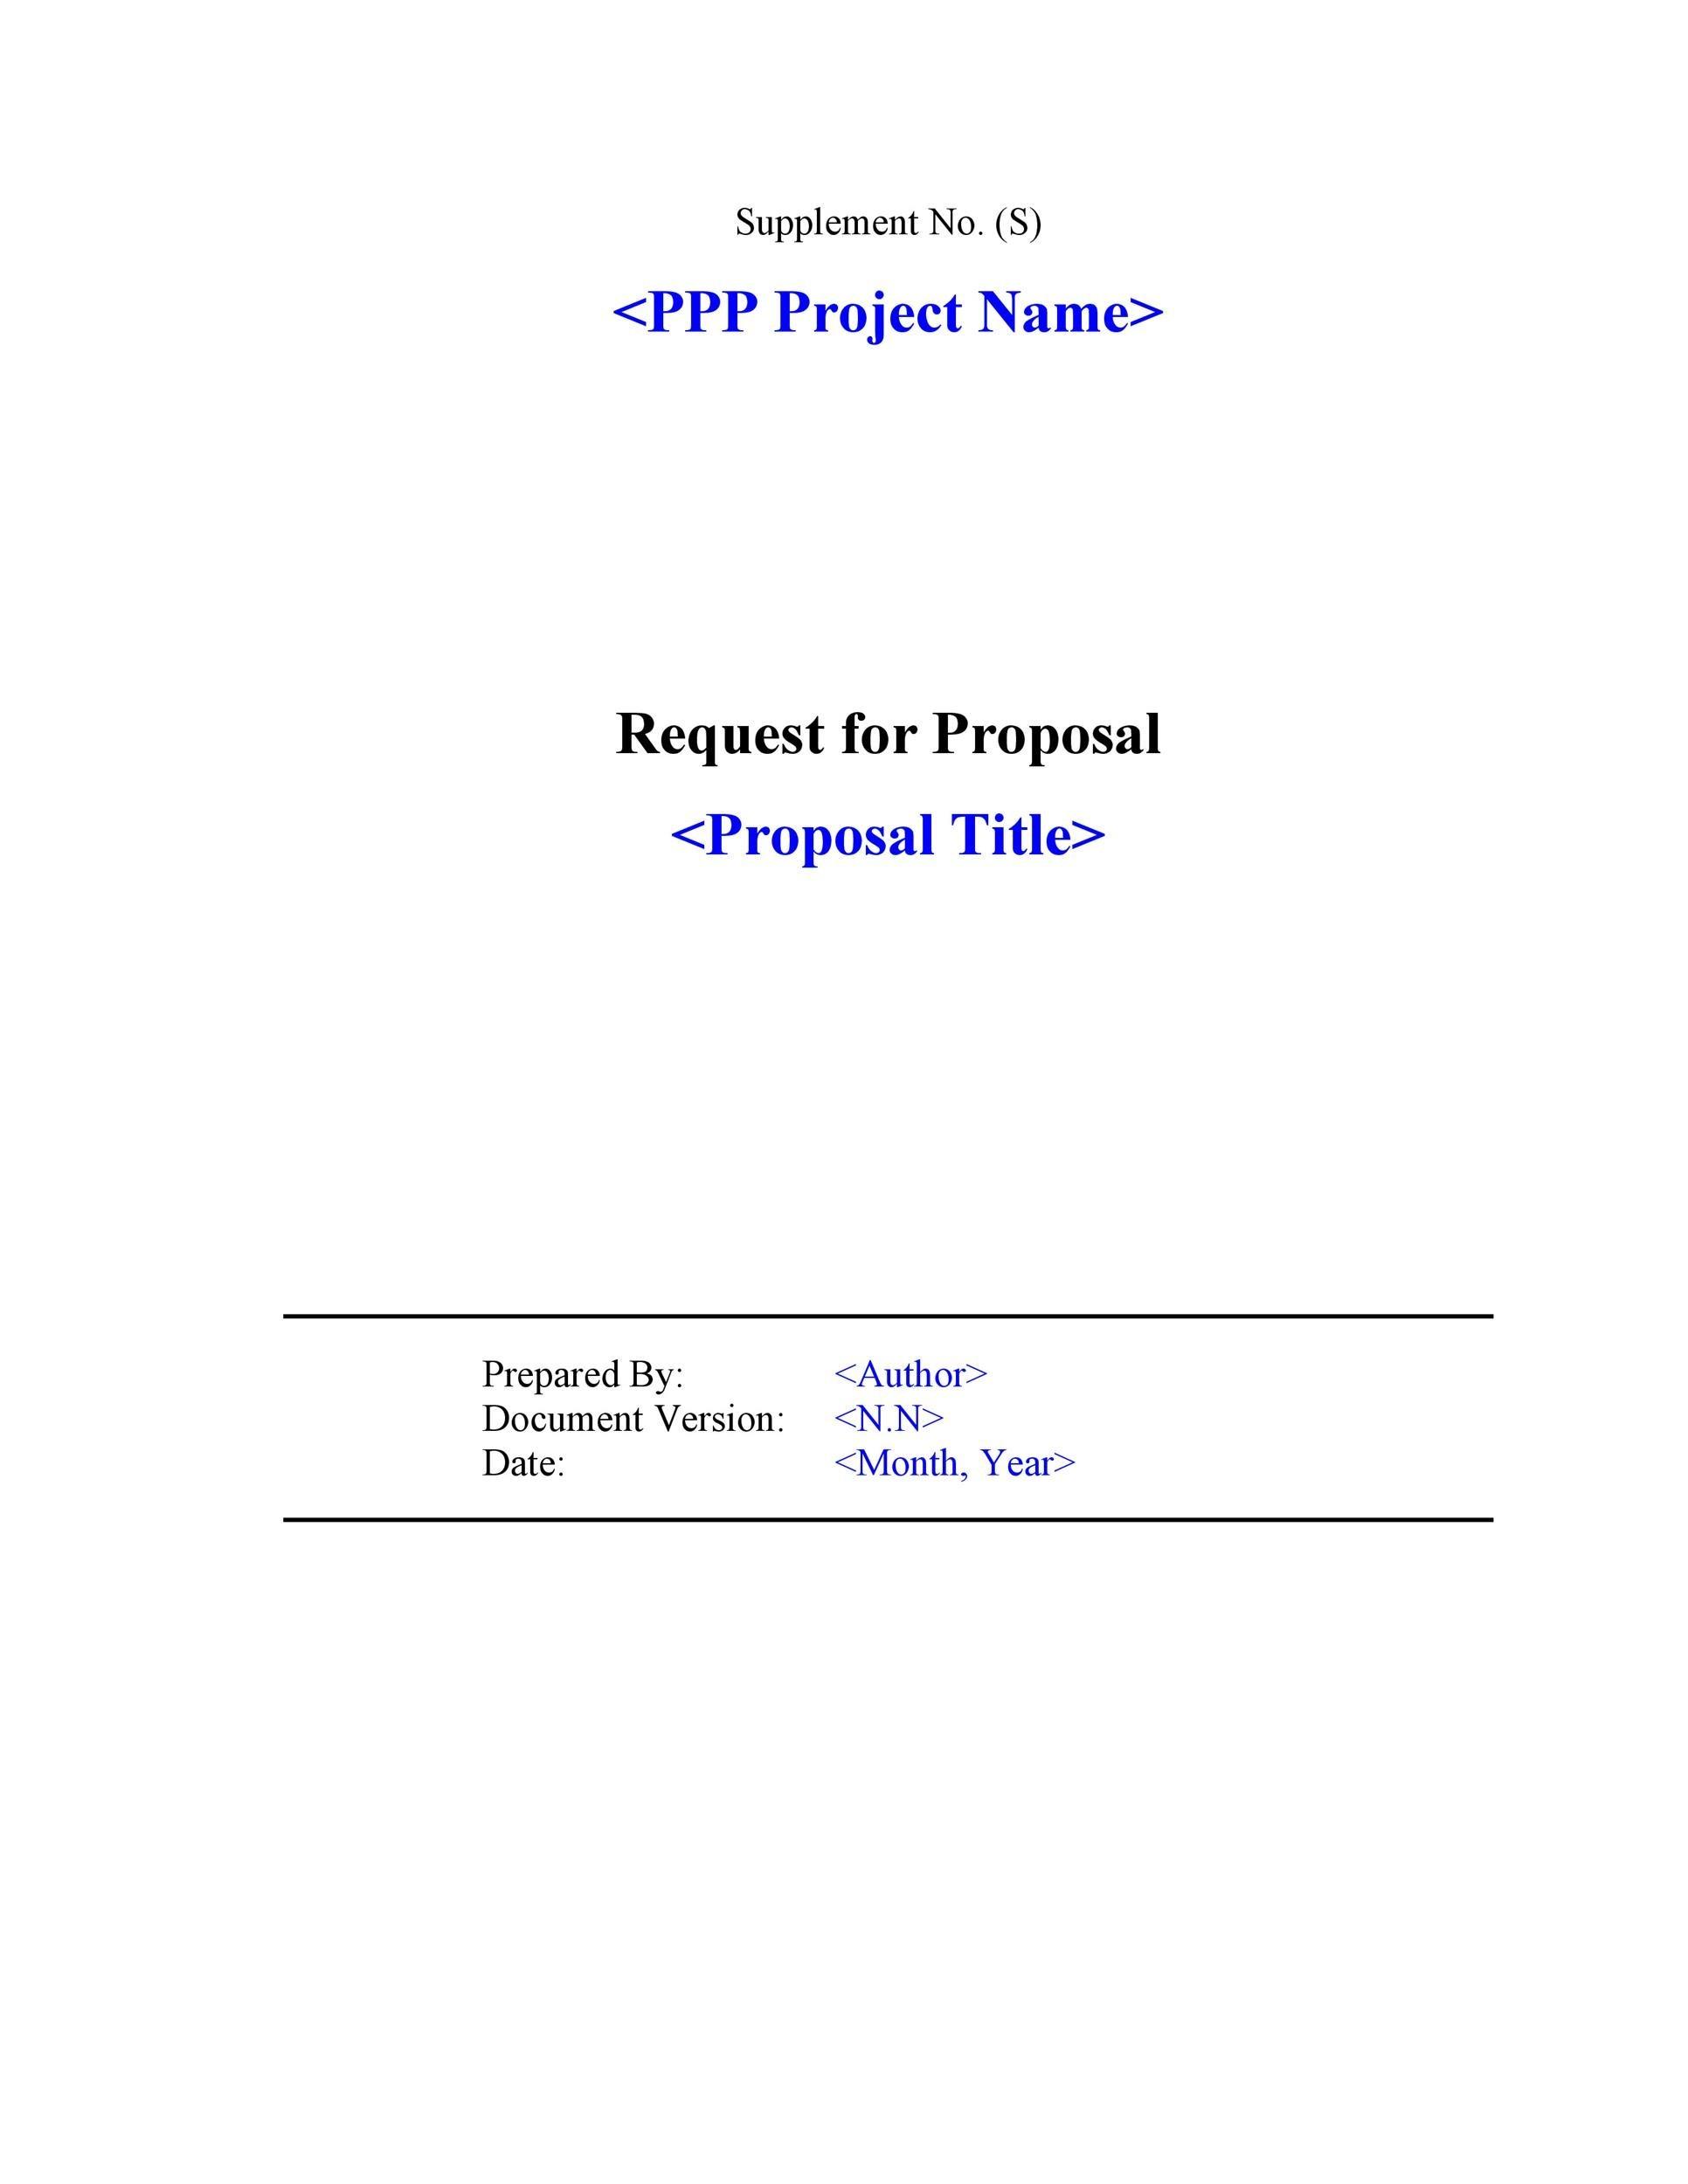 Bidding Template sample of contractor proposal new calendar site – Bidding Template